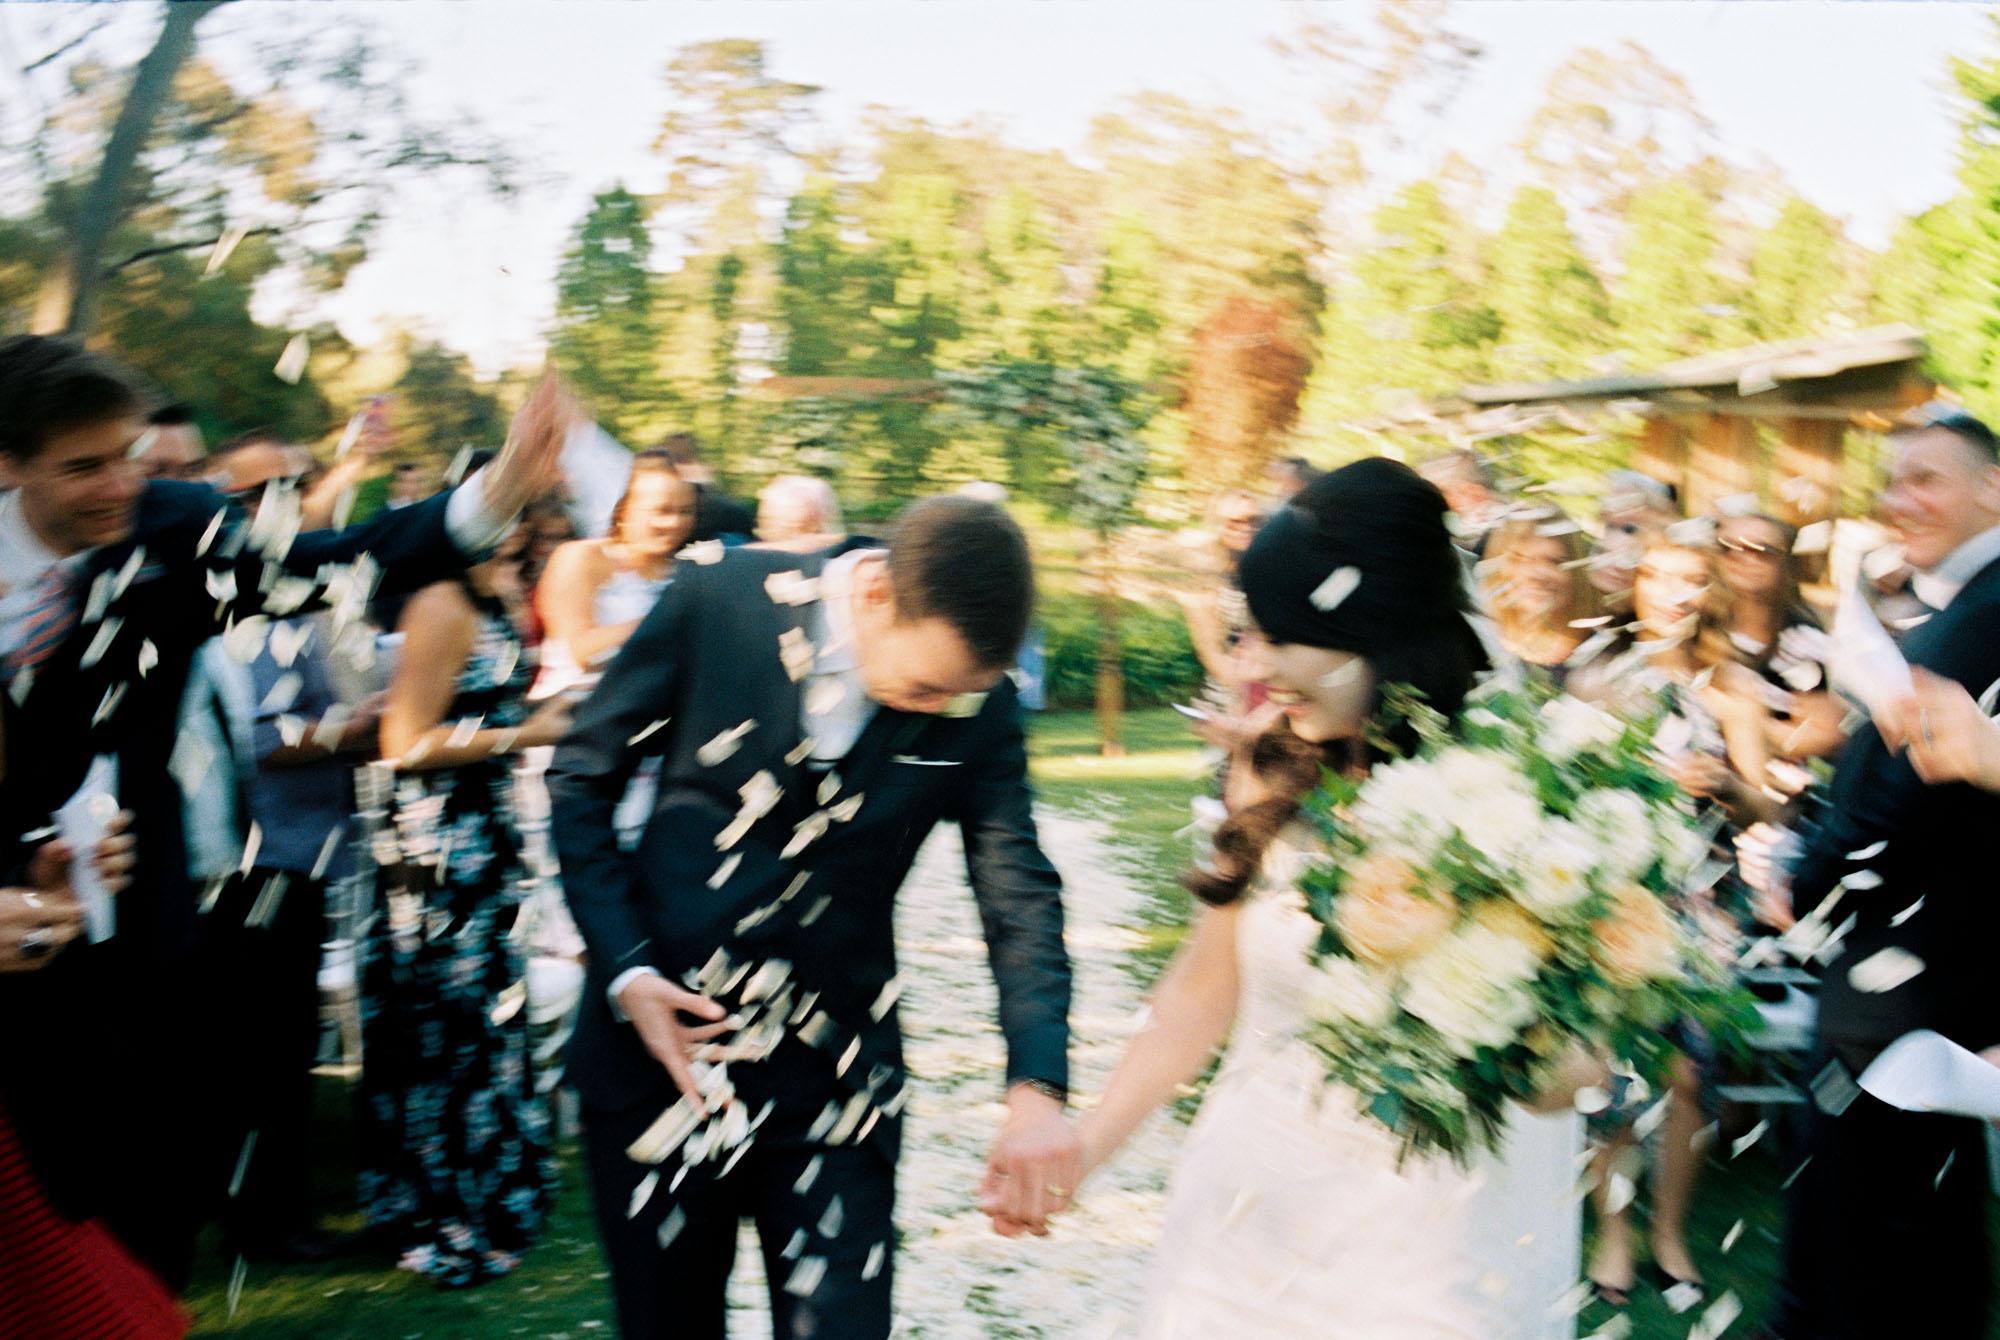 Glen-Ewin-Estate-wedding-photography-049.jpg